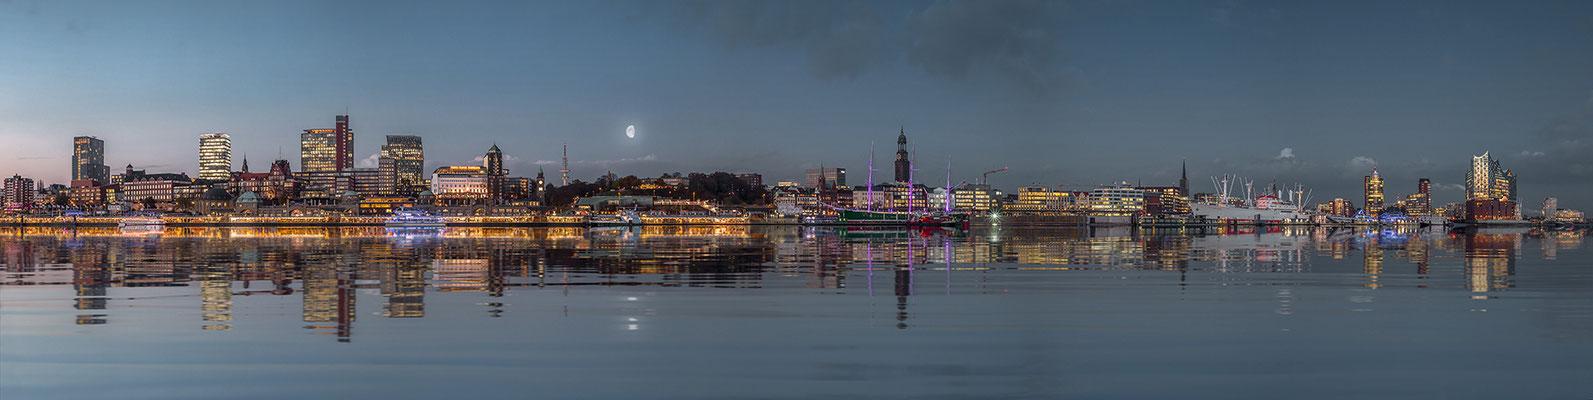 Blick auf Skyline Hamburg · 280 x 70 cm · Leinwand auf Keilrahmen: € 1.390,- ·  Aludibond: € 1.760,-  · Acrylglas auf Aludibond: € 2.190,-  · © Stefan Korff